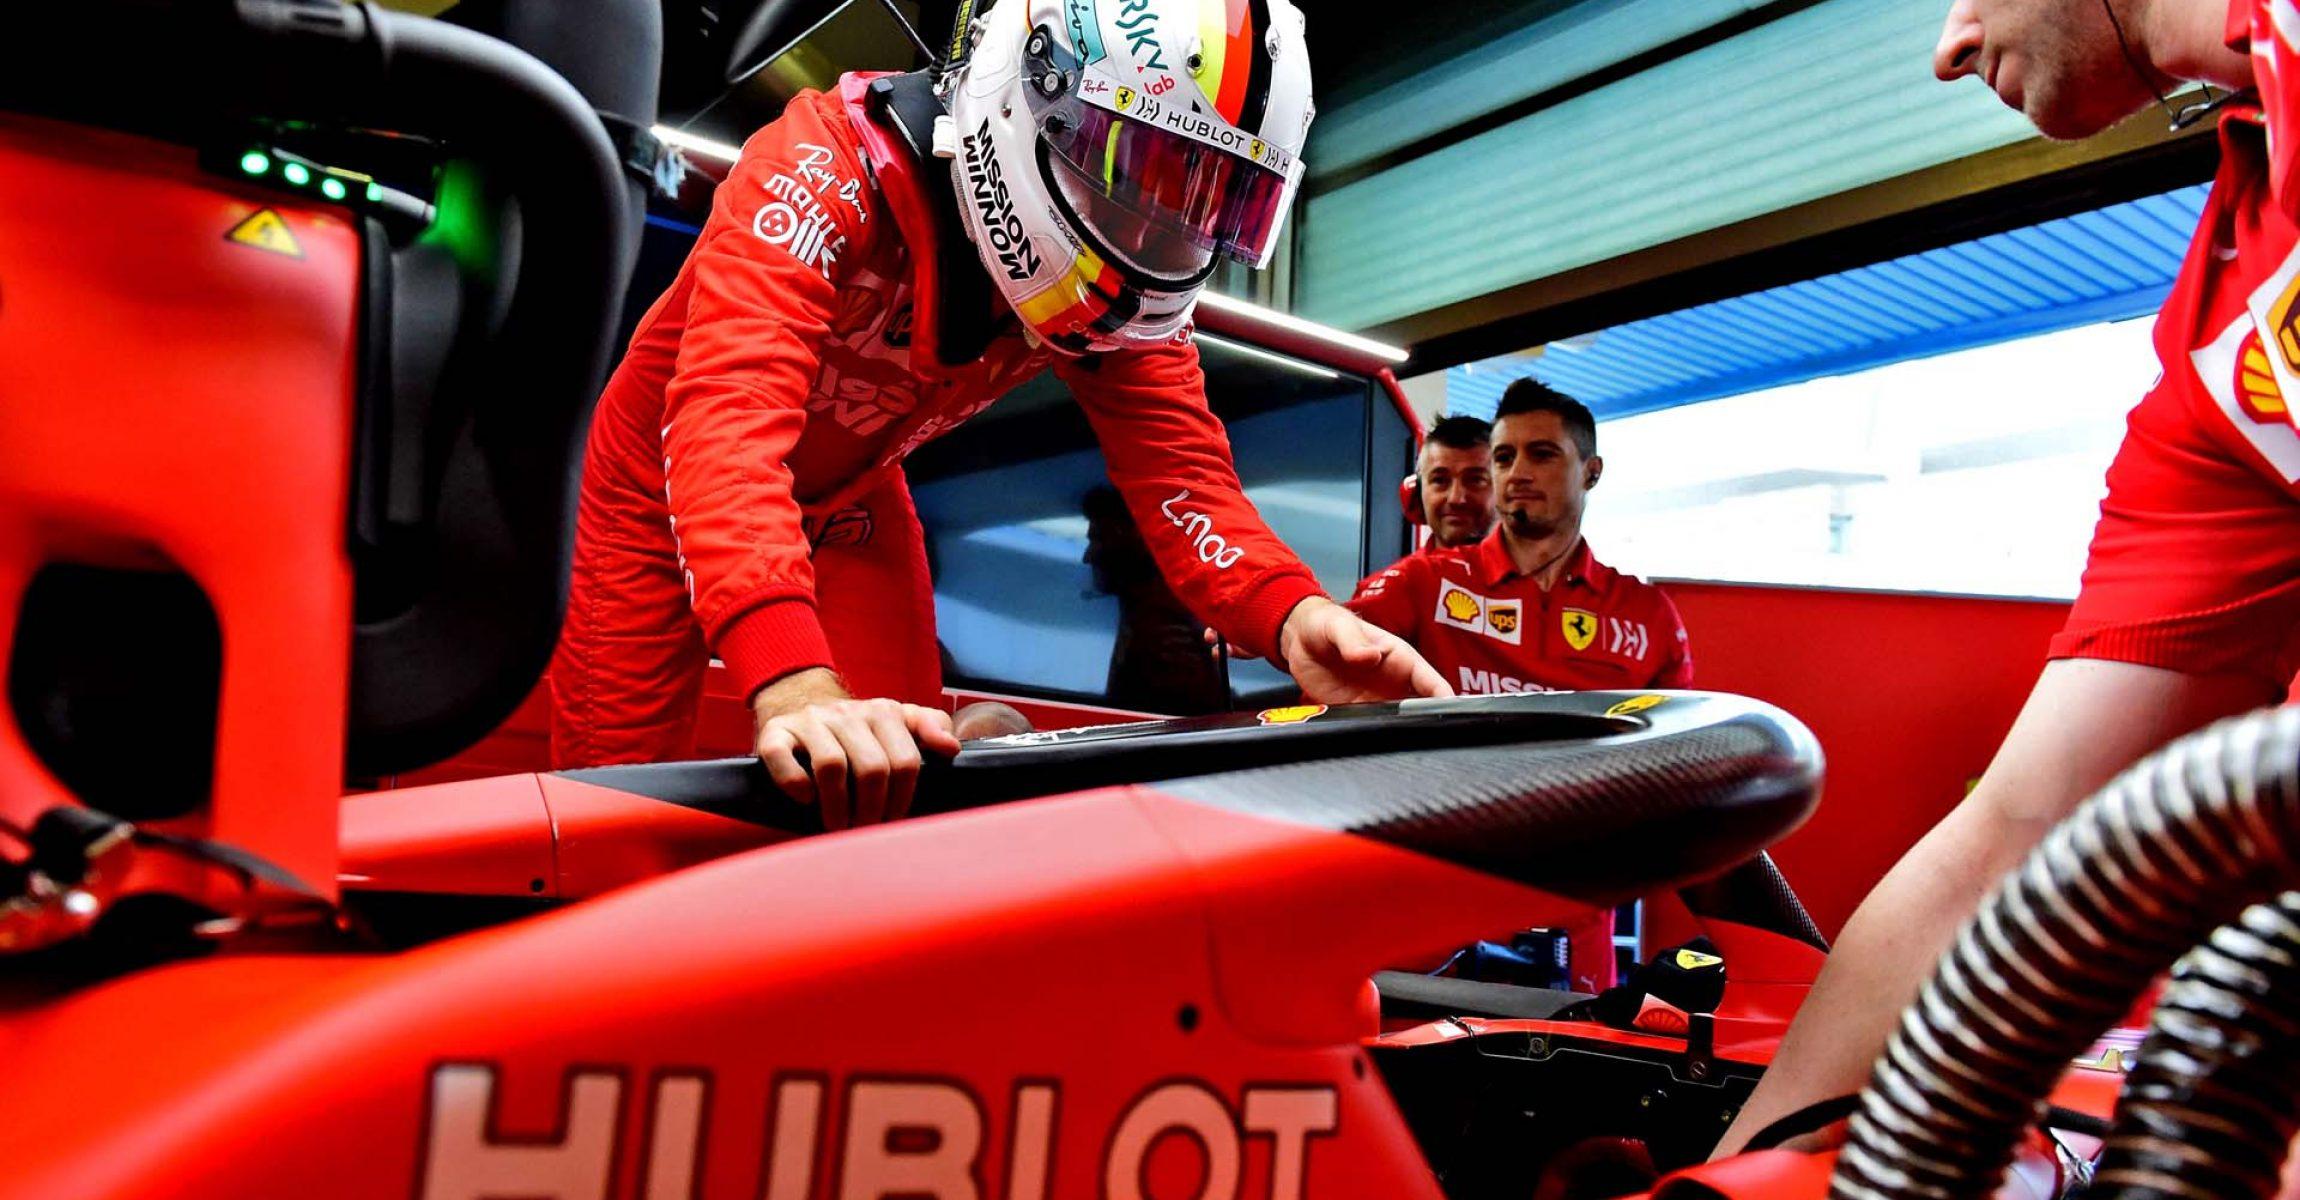 TEST T5 ABU DHABI 2019 - MARTEDÌ 03/12/2019 credit: @Scuderia Ferrari Press Office Sebastian Vettel